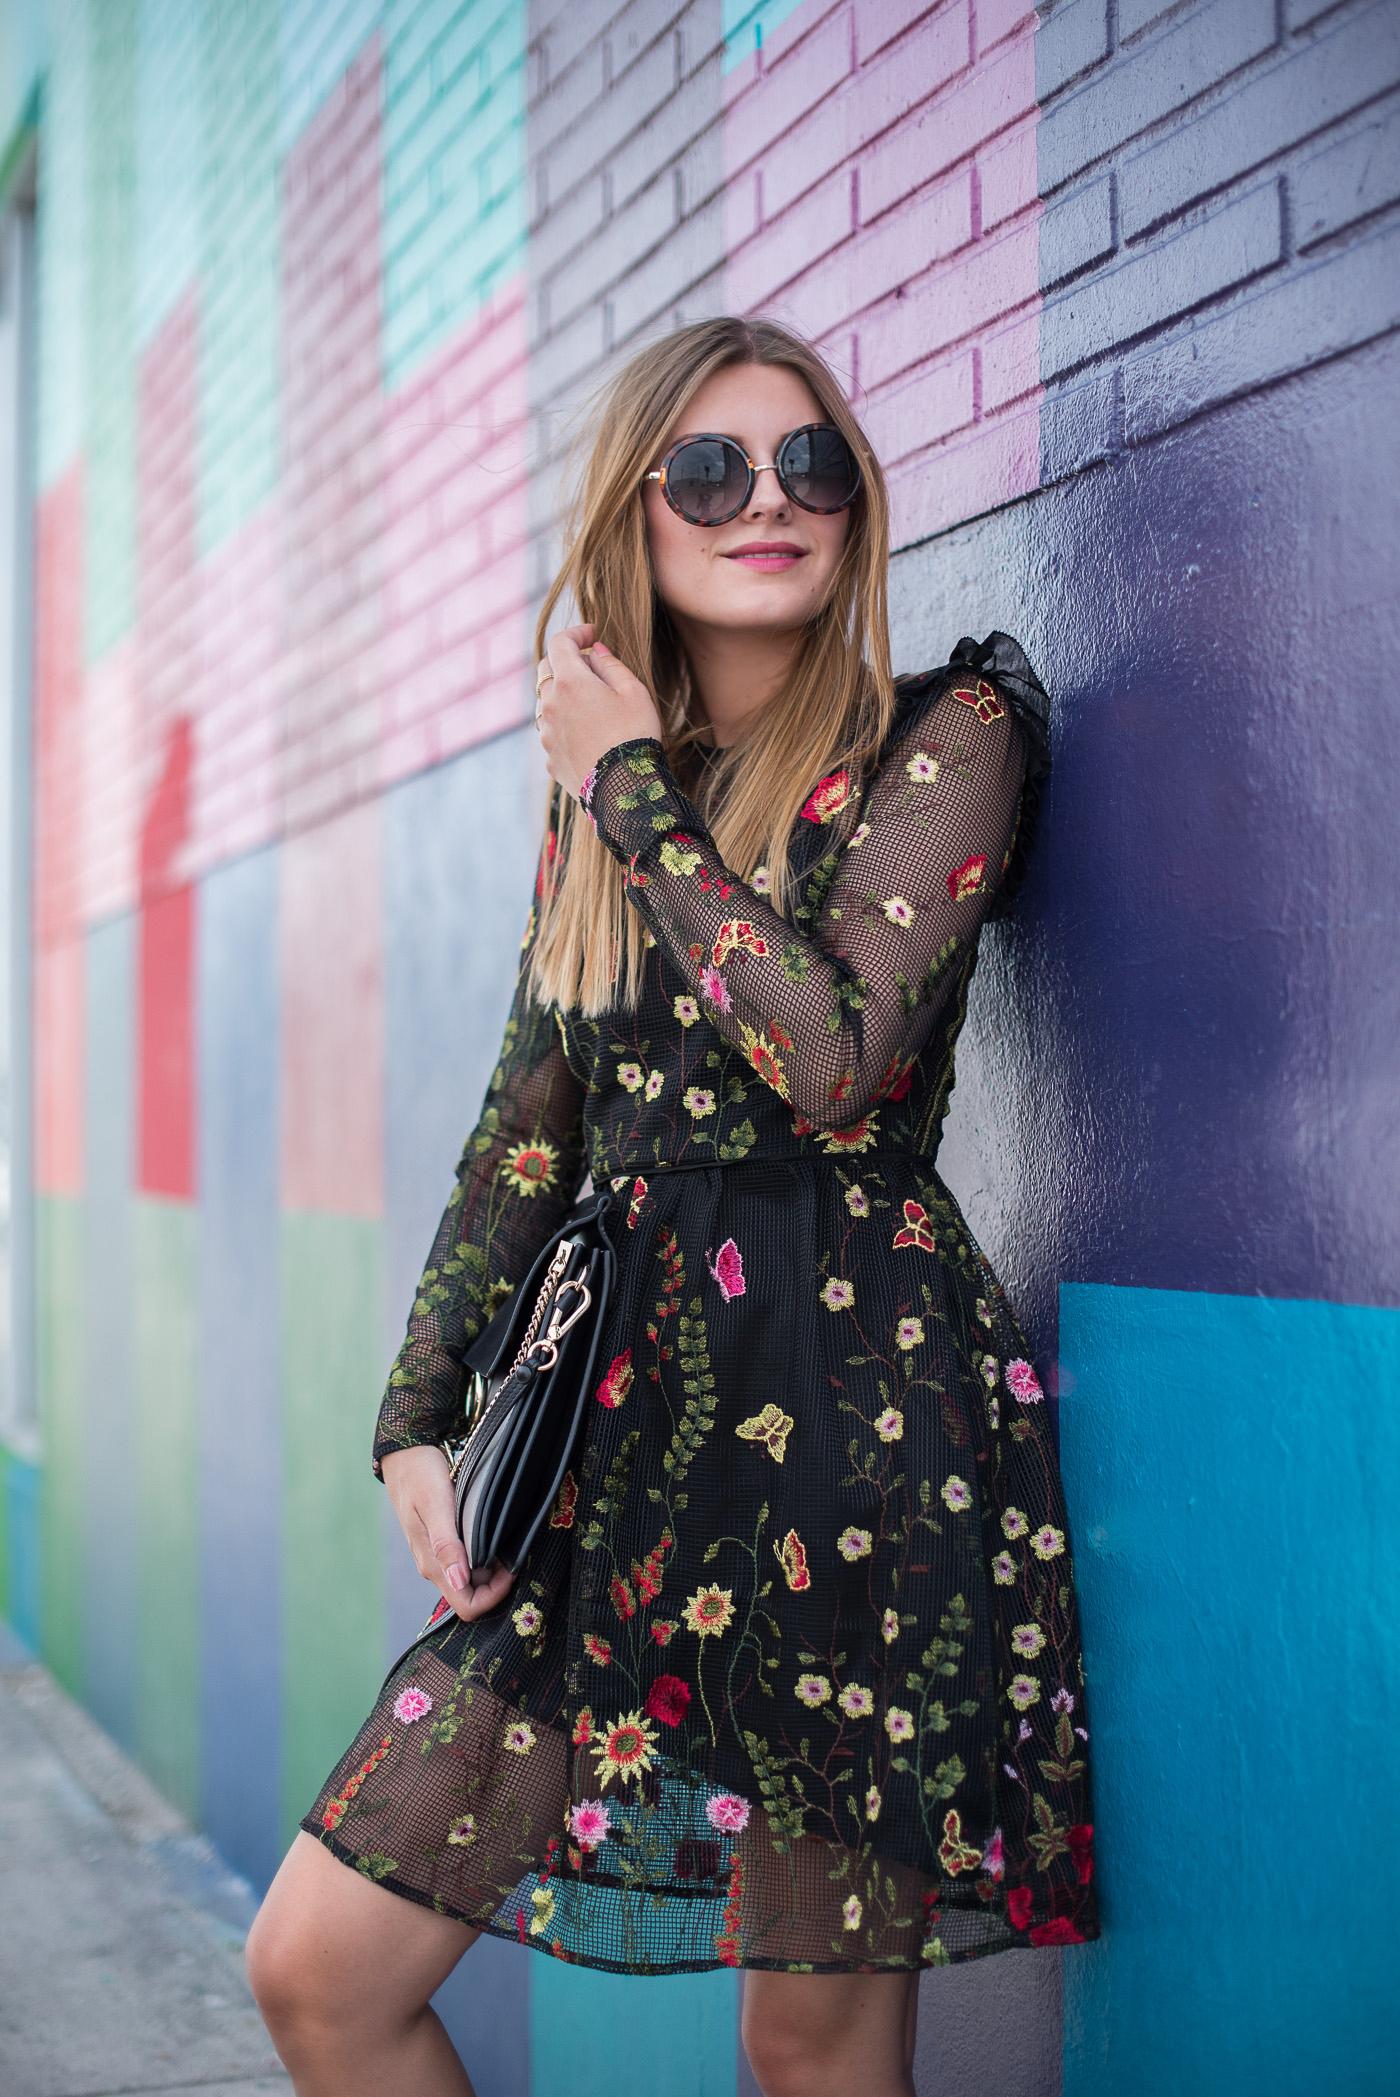 miami_wynwood_walls_flower_print_dress_5